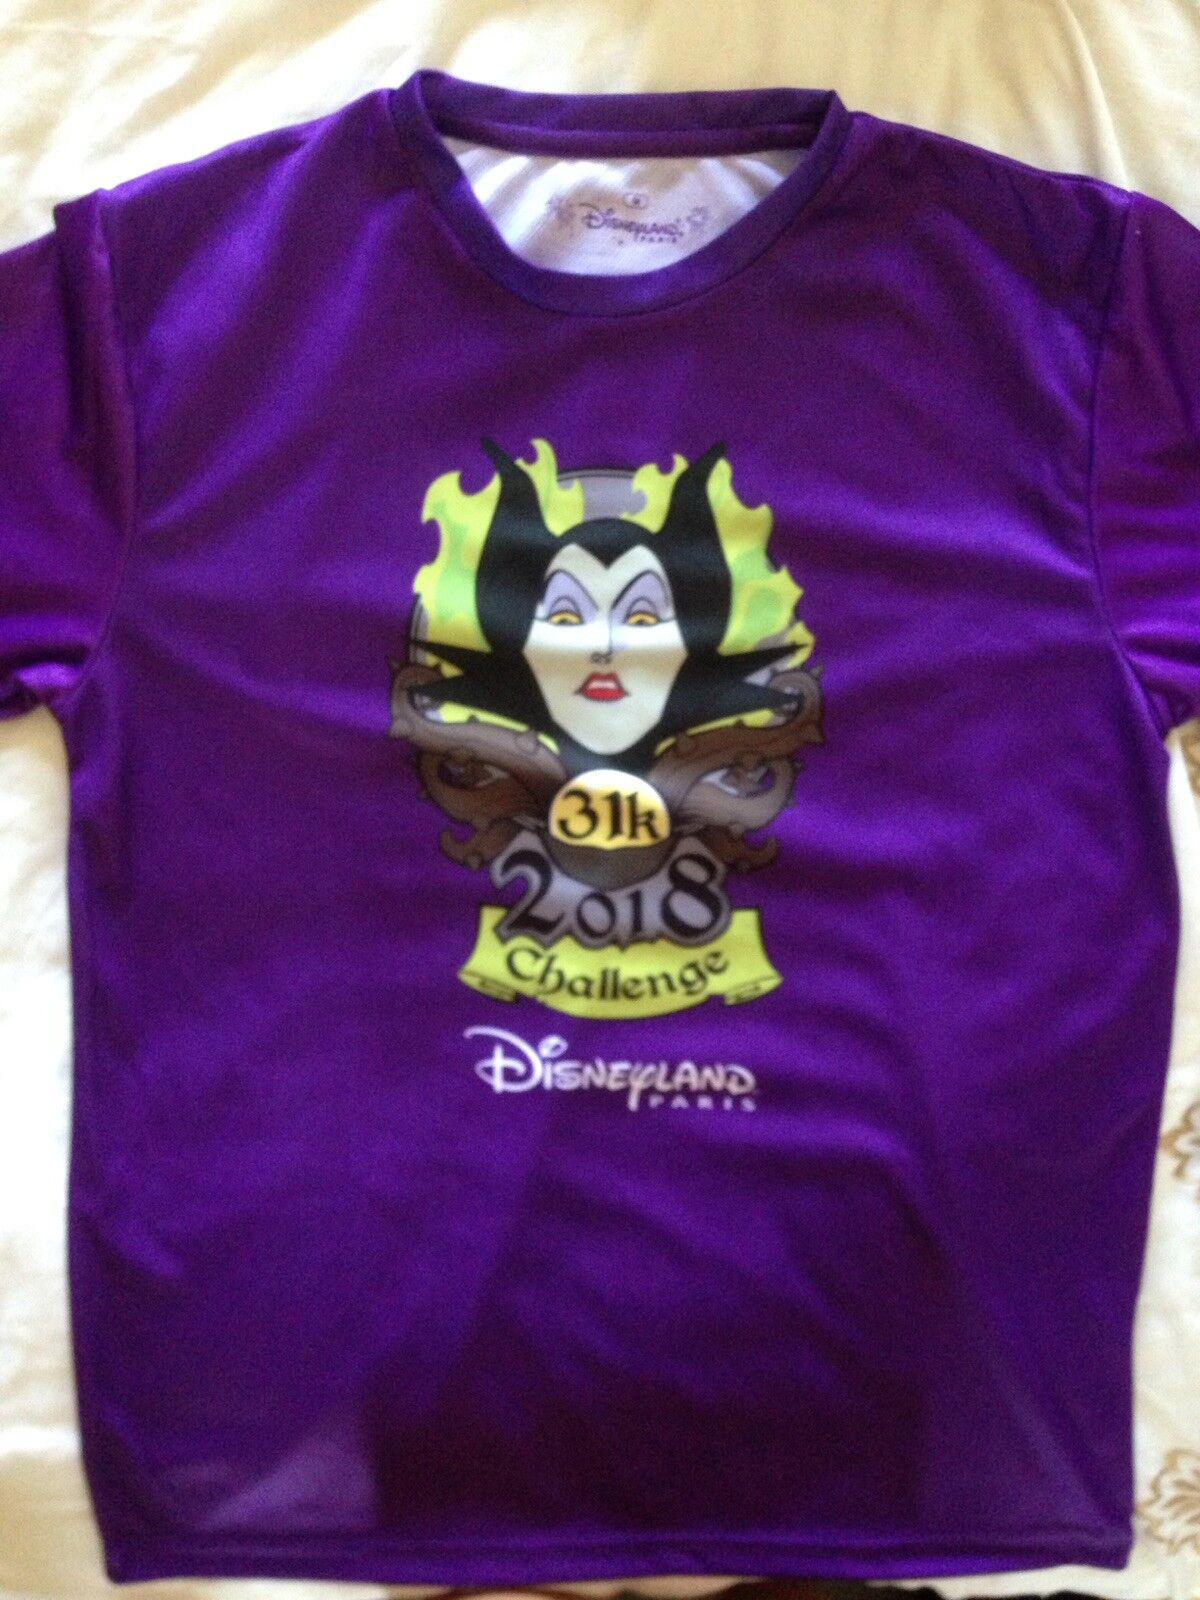 Run Disney Official Disneyland Paris 31k Challenge Mens Running Shirt Medium M